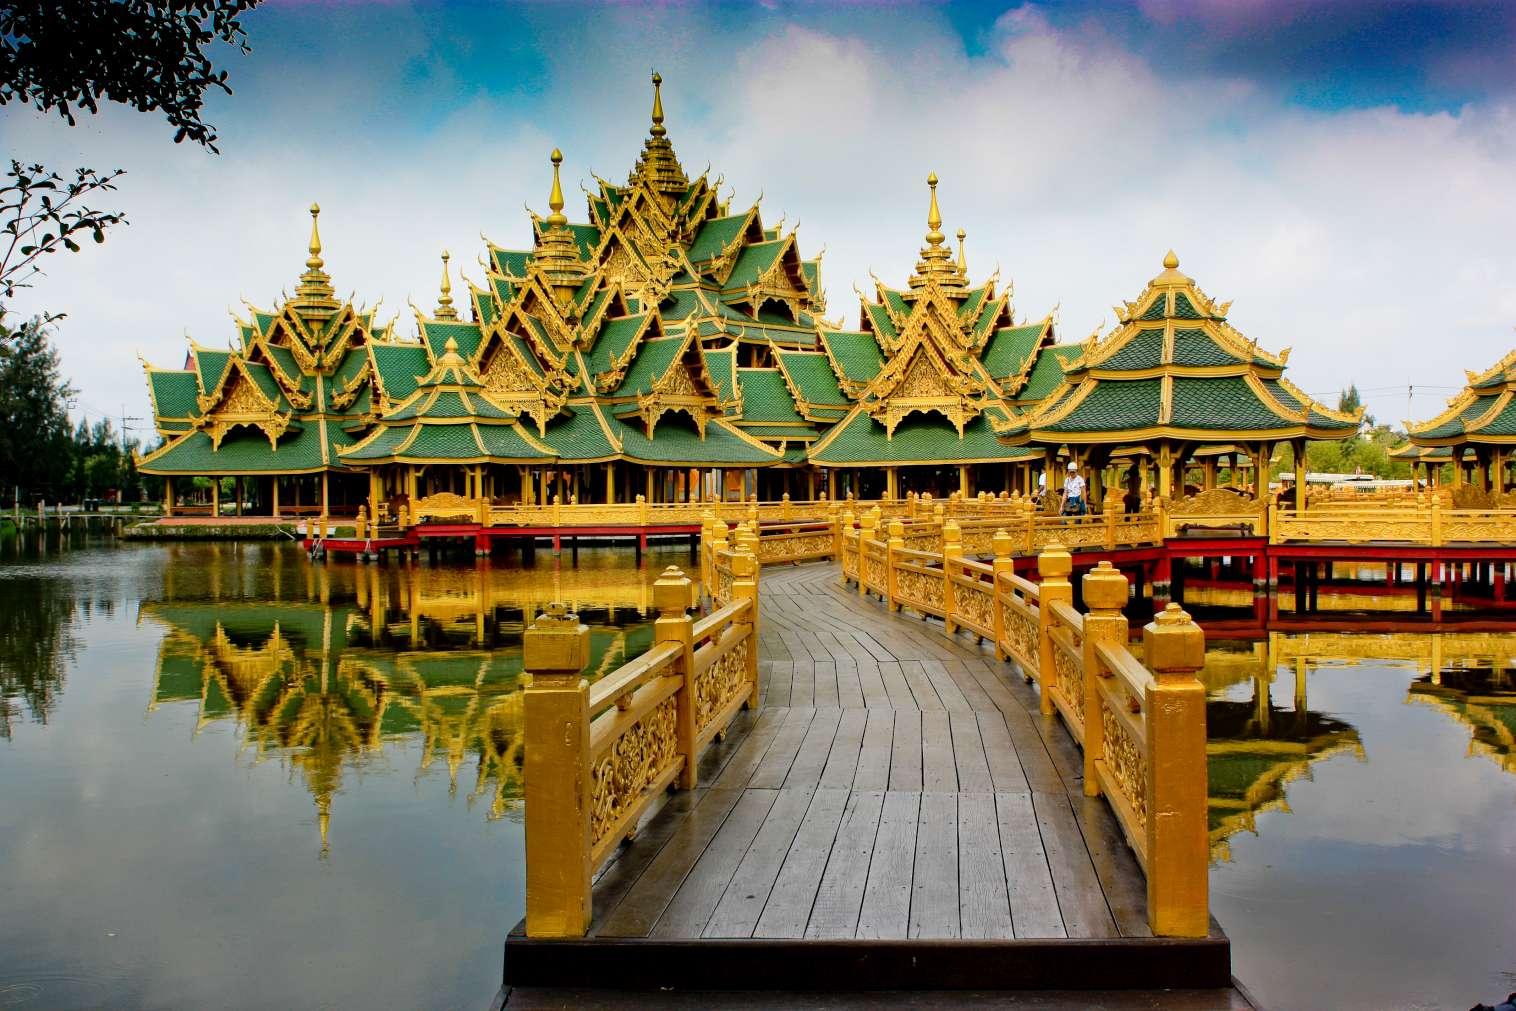 D Art Exhibition In Bangkok : Maung boran ancient city samutprakarn thailand flickr